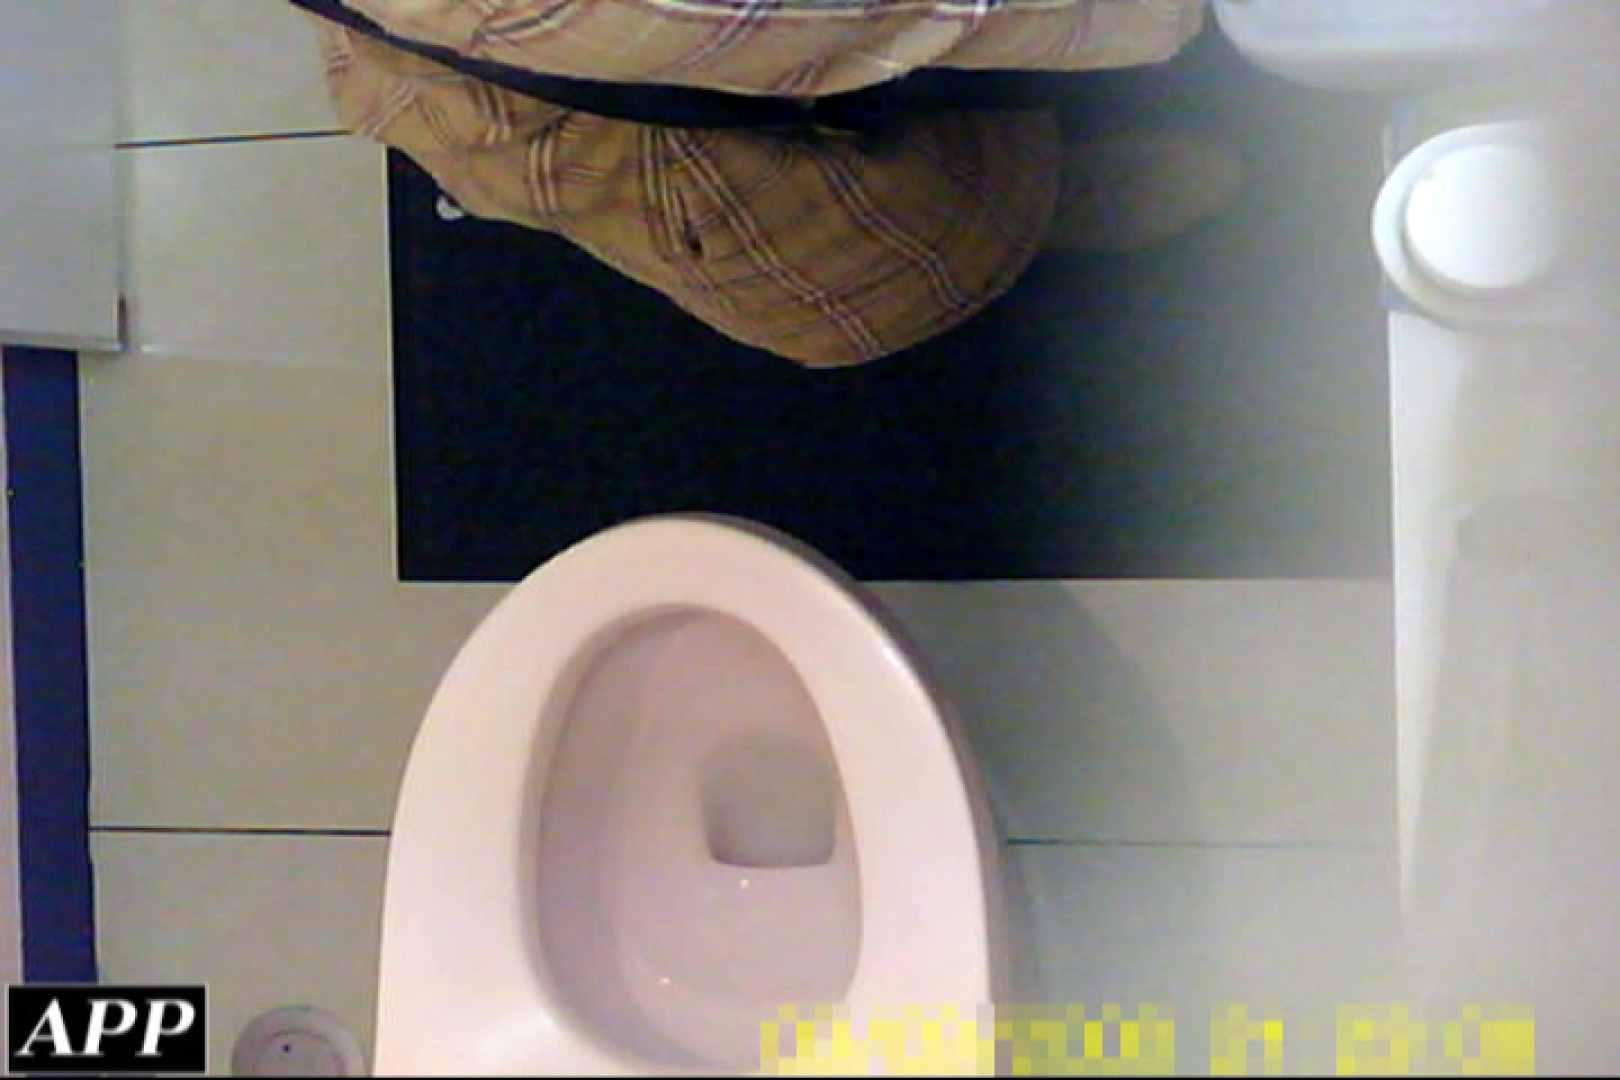 3視点洗面所 vol.08 盗撮で悶絶 エロ画像 108画像 18